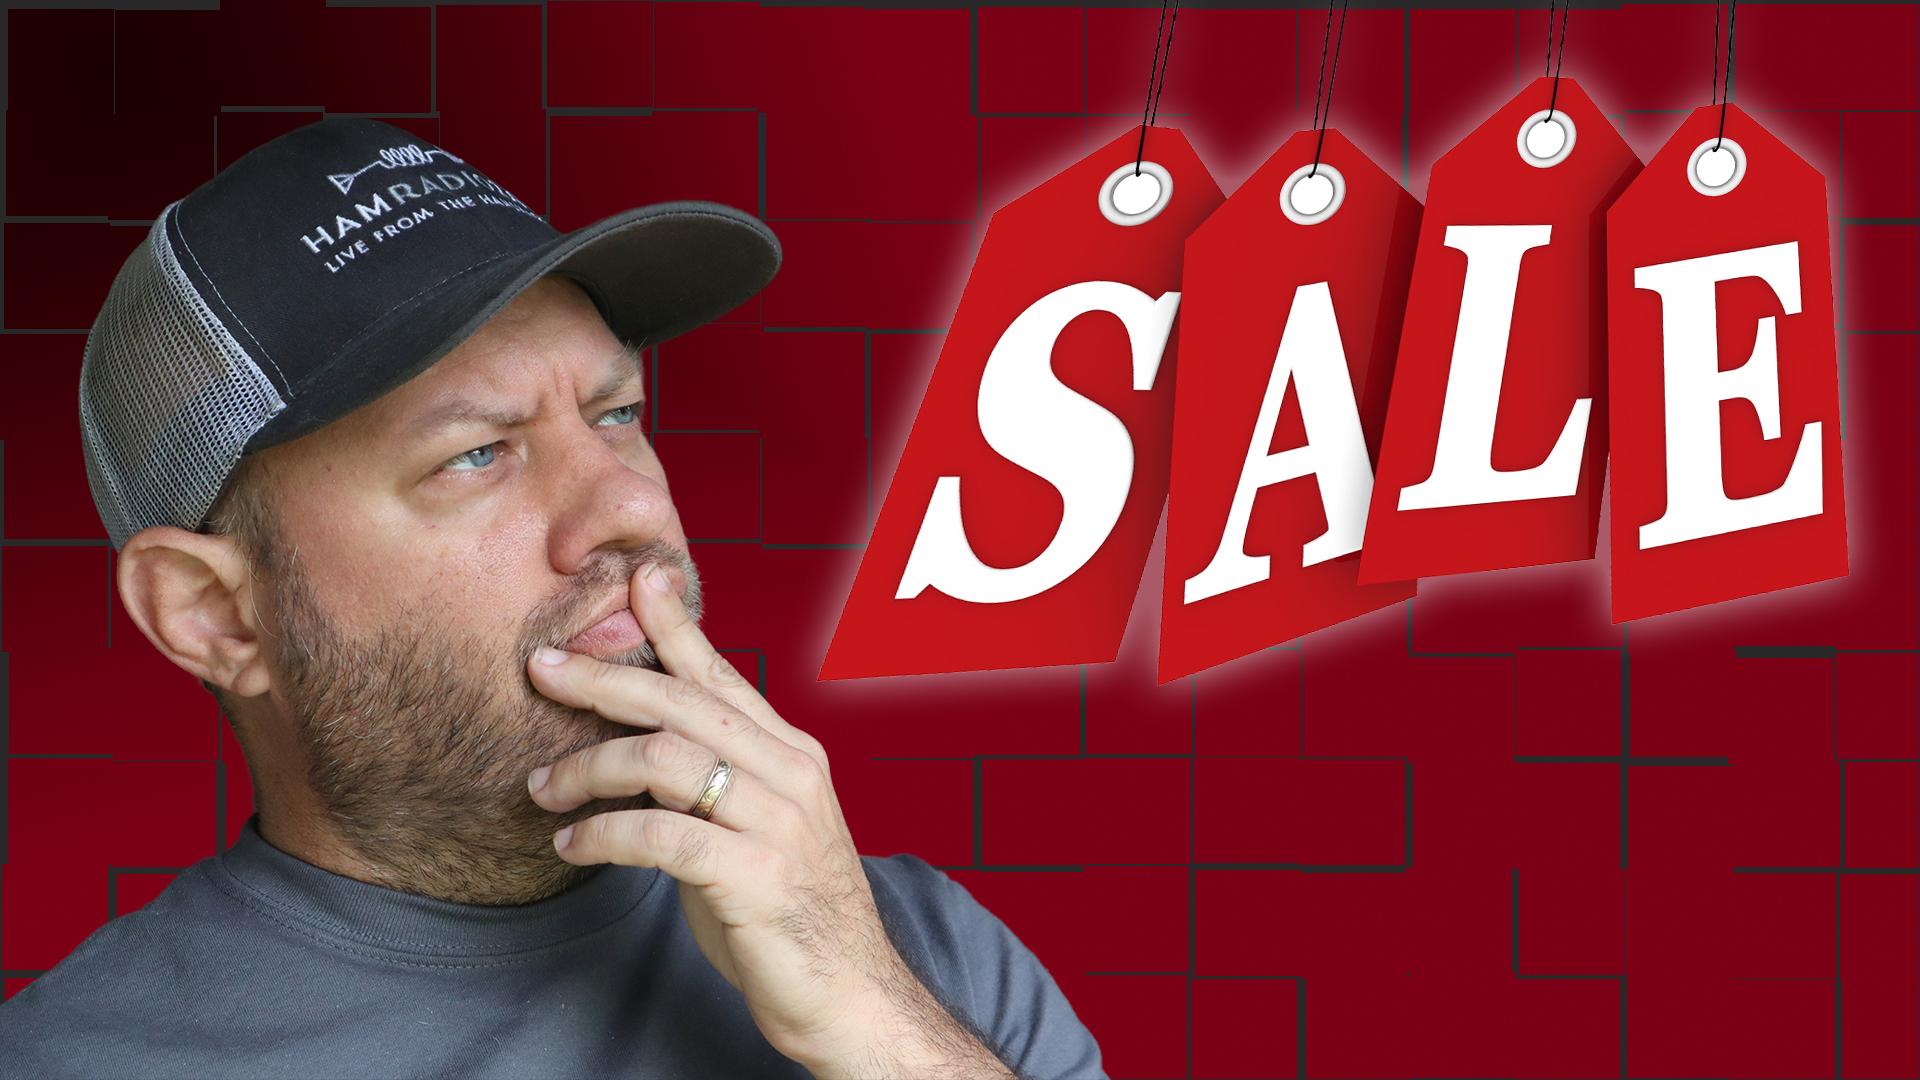 Episode 356: Ham Radio Shopping Deals for April 24th